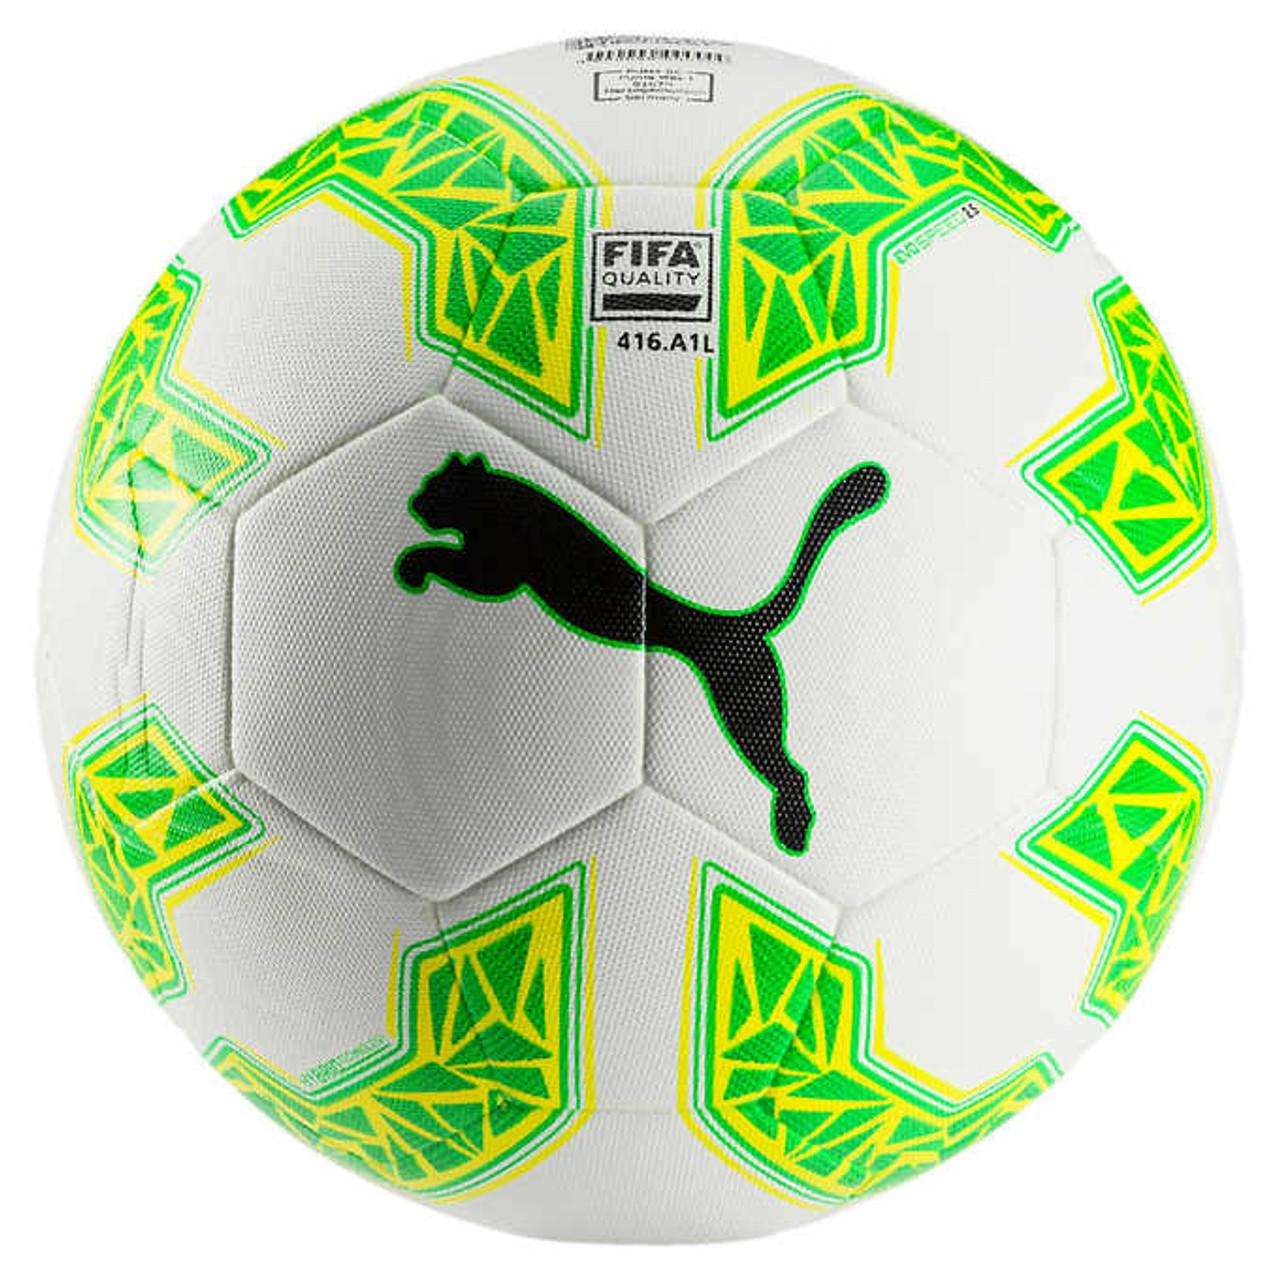 78b64c6d3517 Puma Evospeed 2.5 Hybrid Soccer Ball (1184200)